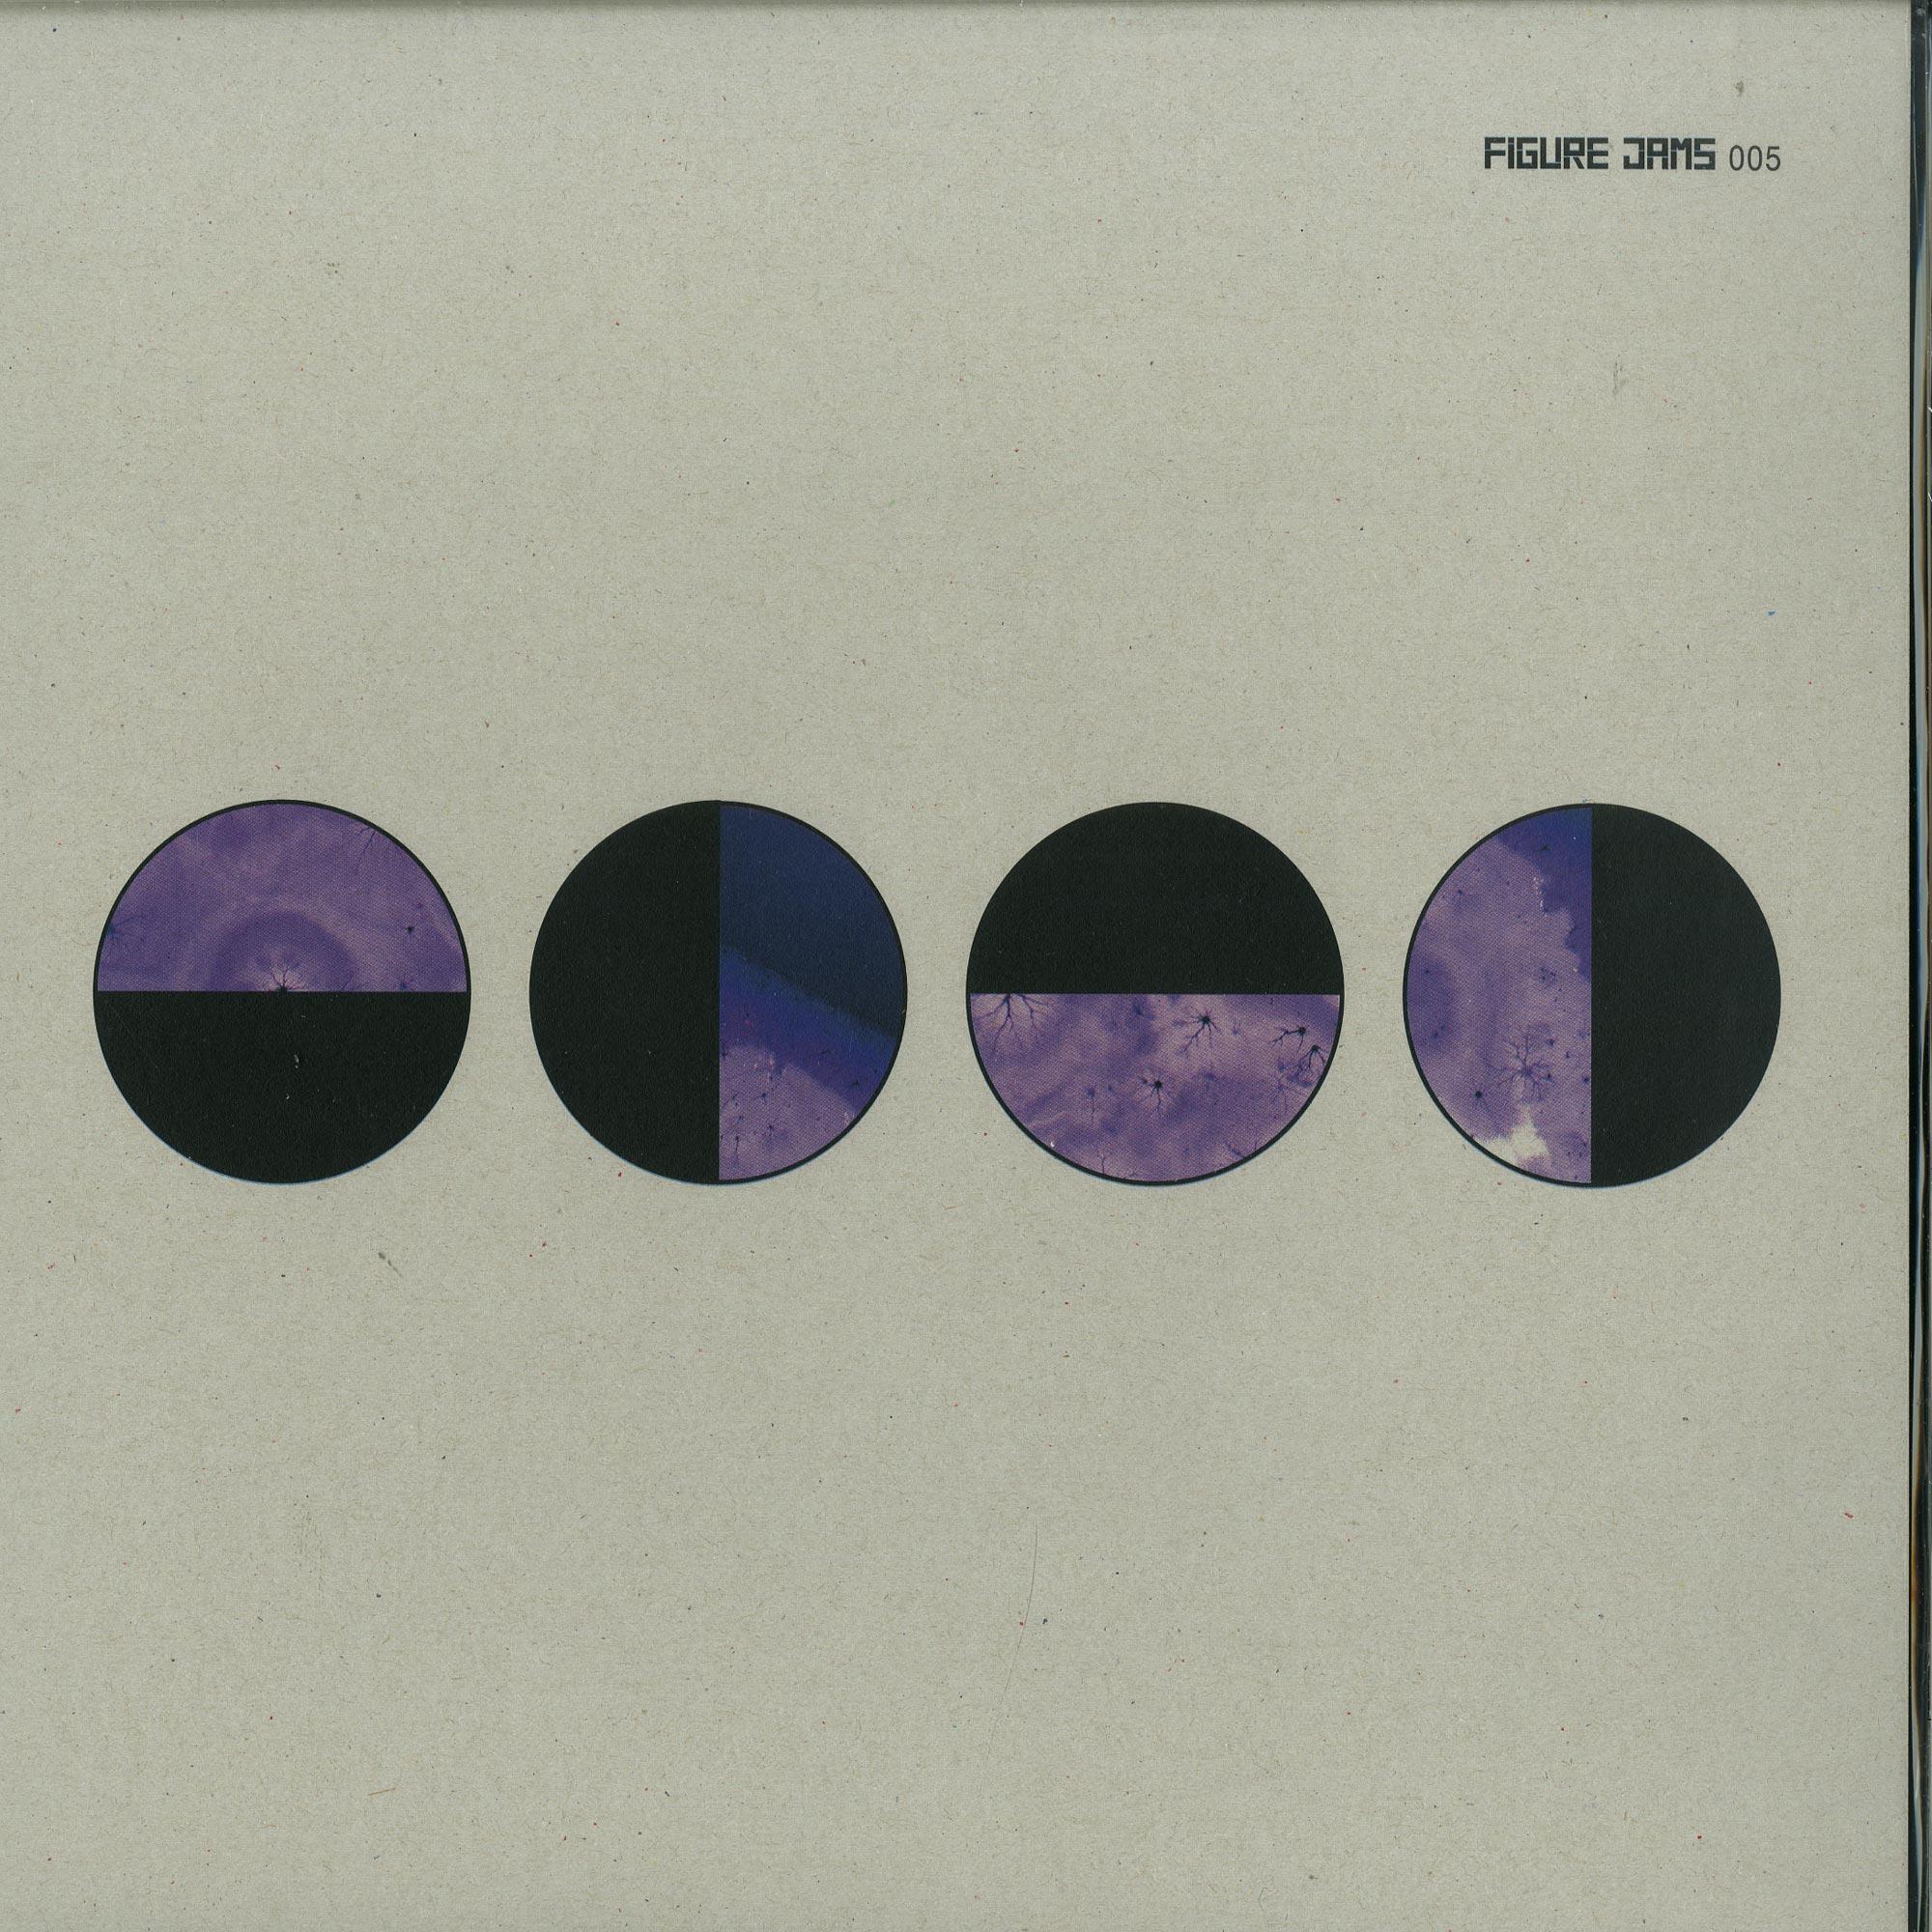 Juxta Position x Pablo Mateo - FIGURE JAMS 005